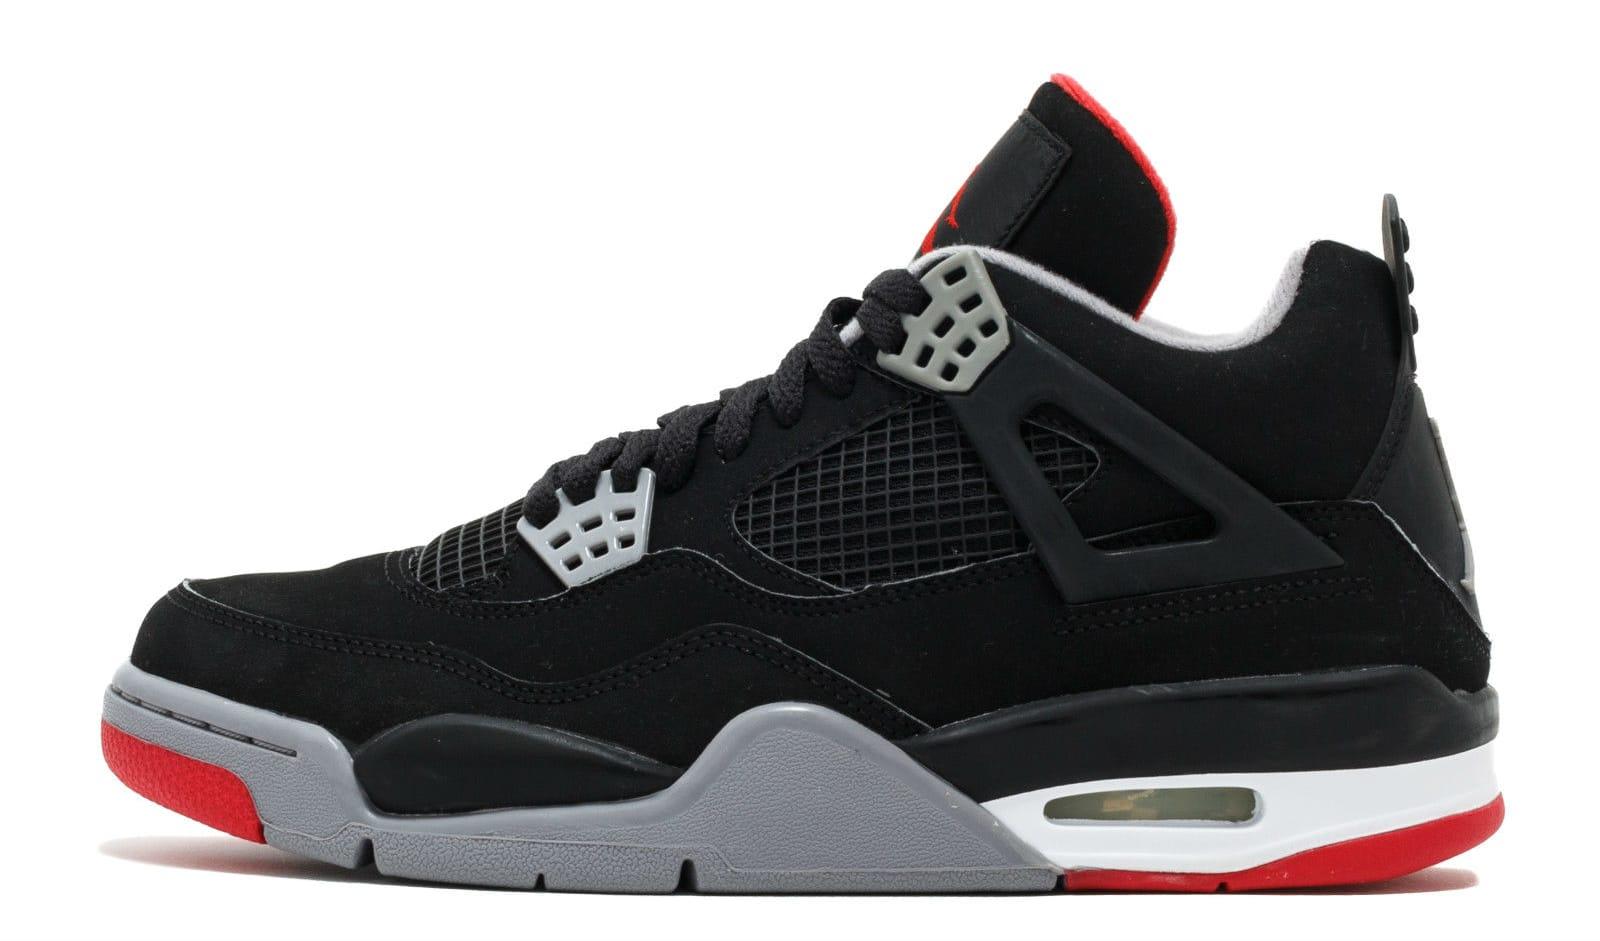 Air Jordan 4 \u0027Black/Cement\u0027